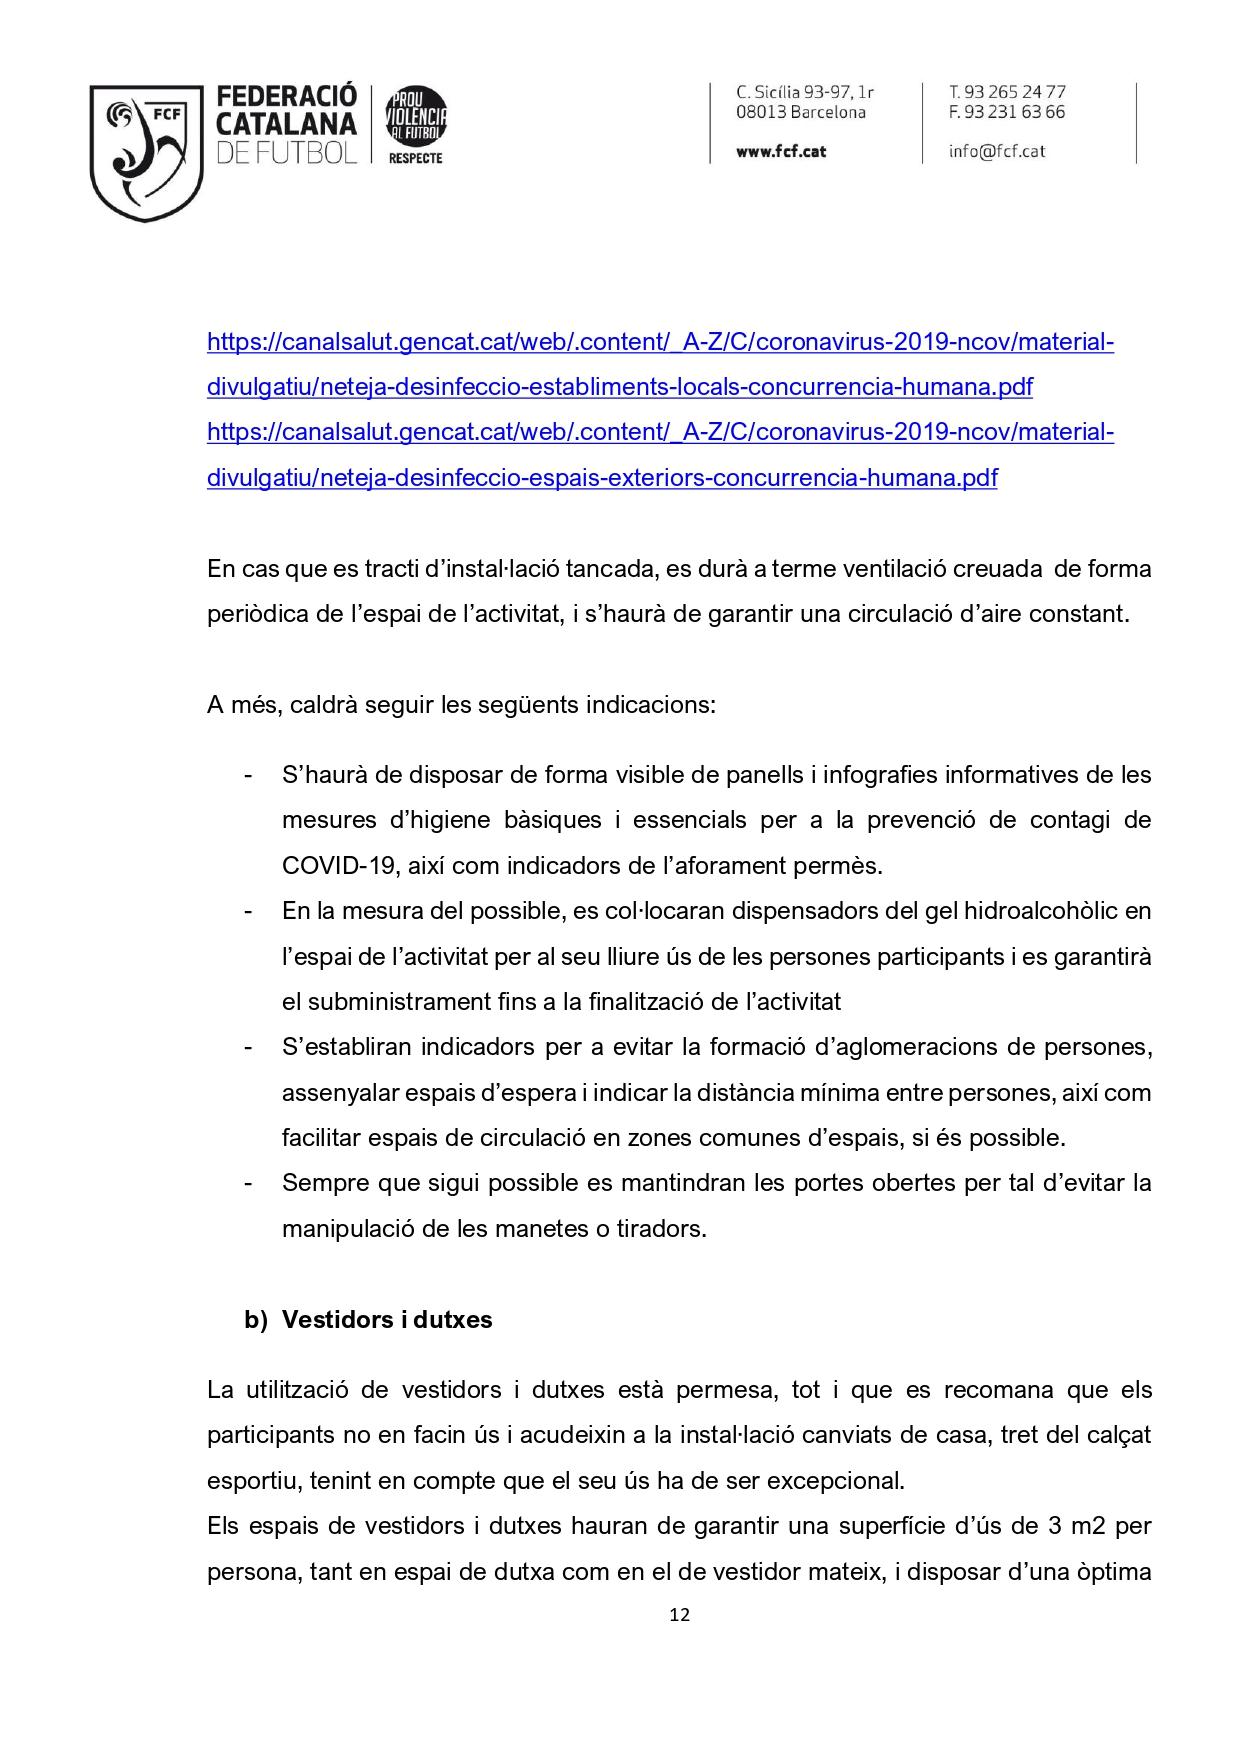 Circular Actualització Protocol Competicions _set21_2_page-0012